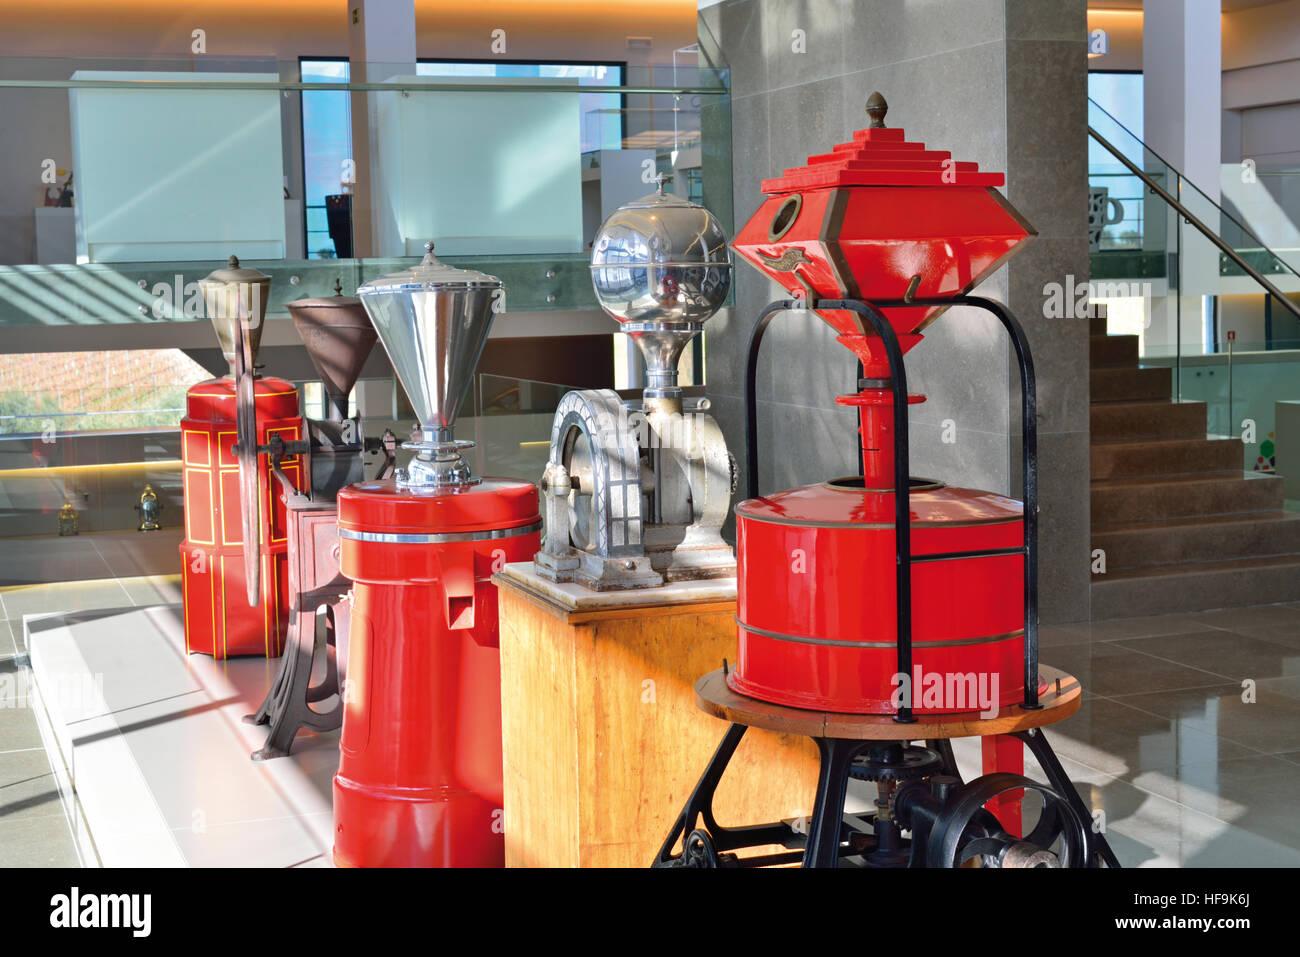 Portugal, Alentejo: Historische Kaffeemühlen in das Kaffeemuseum Centro de Ciencia tun Café Delta Cafés Stockbild